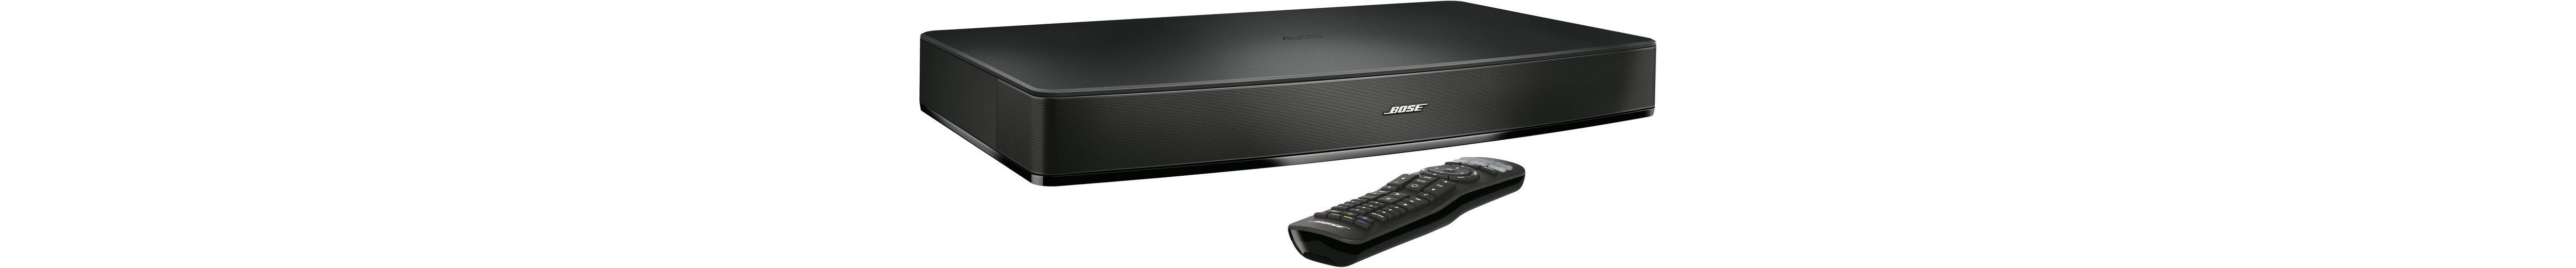 Bose® Solo 15 Series II TV Soundbar